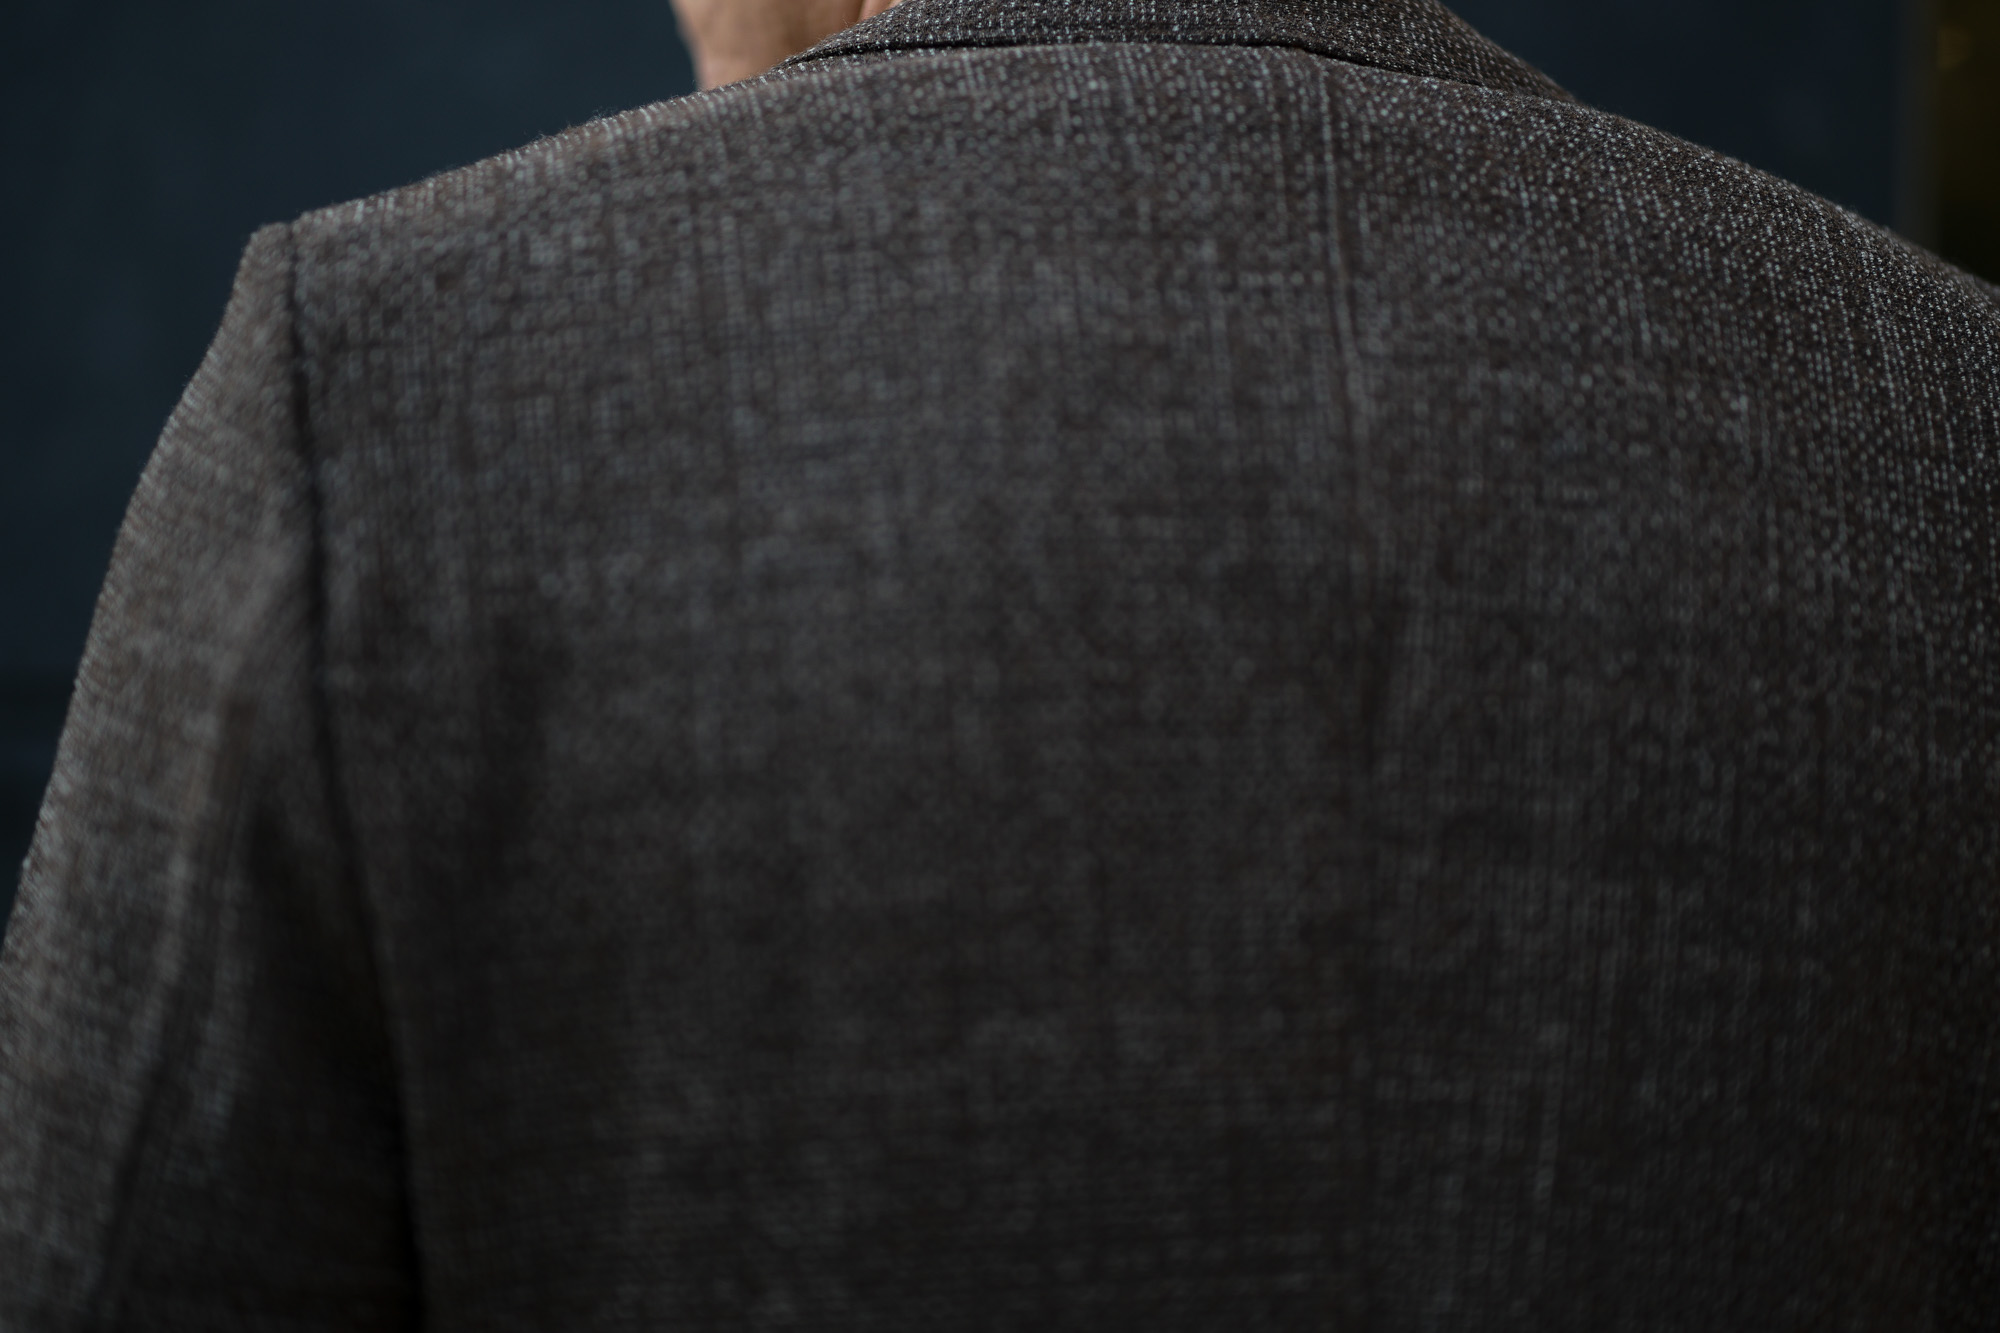 BELVEST (ベルベスト) CAPSULE SINGLE BREASTE JACKET 2PATCH WOOL SLAB COMFORT ストレッチ サマーウールスラブ ジャケットBROWN (ブラウン) Made in italy (イタリア製) 2020 春夏新作 愛知 名古屋 altoediritto アルトエデリット